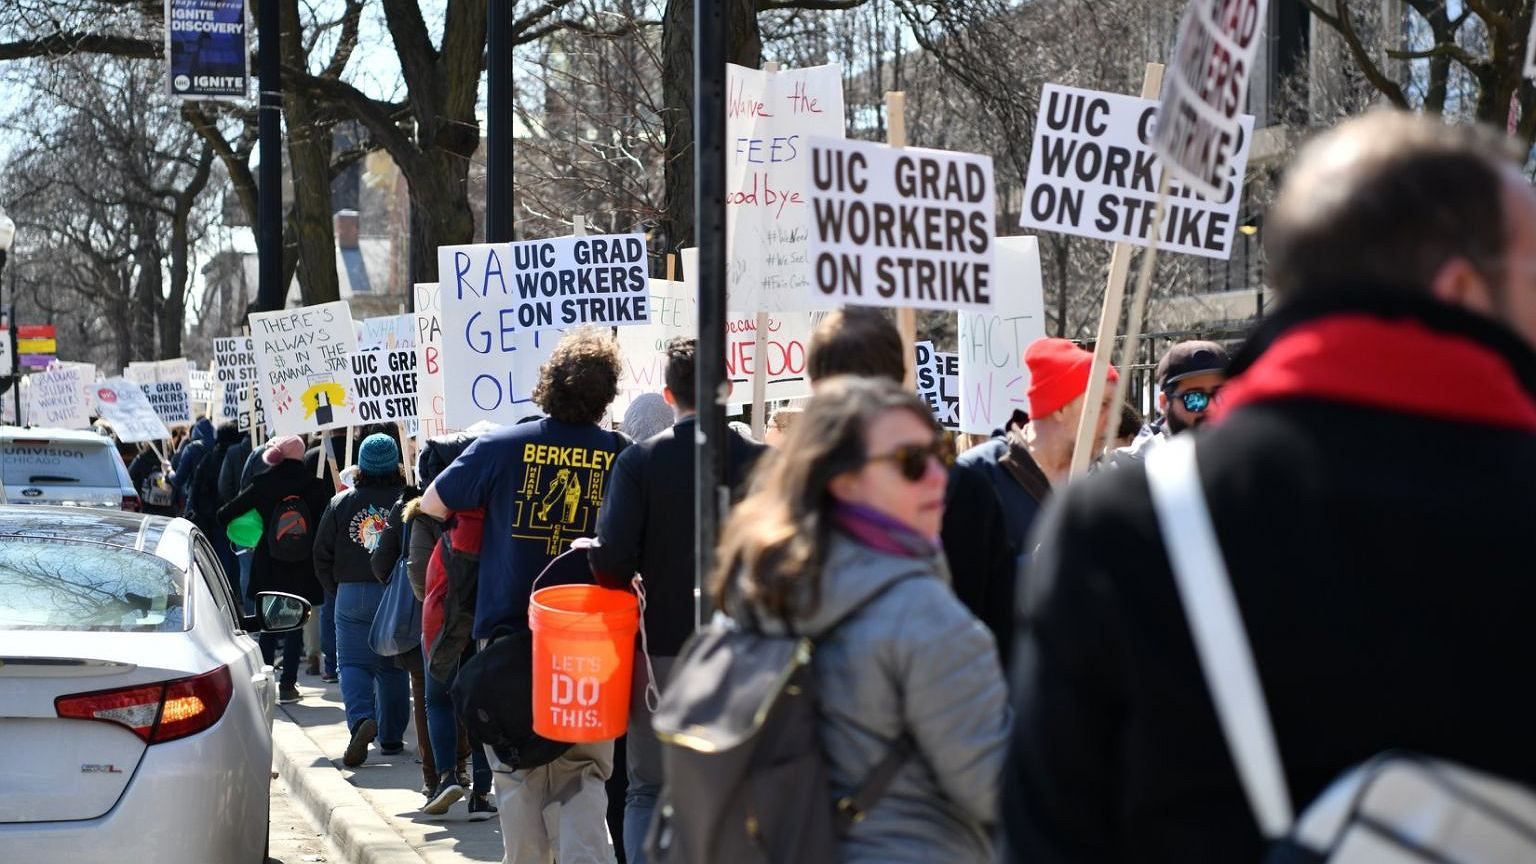 Strajk na UIC